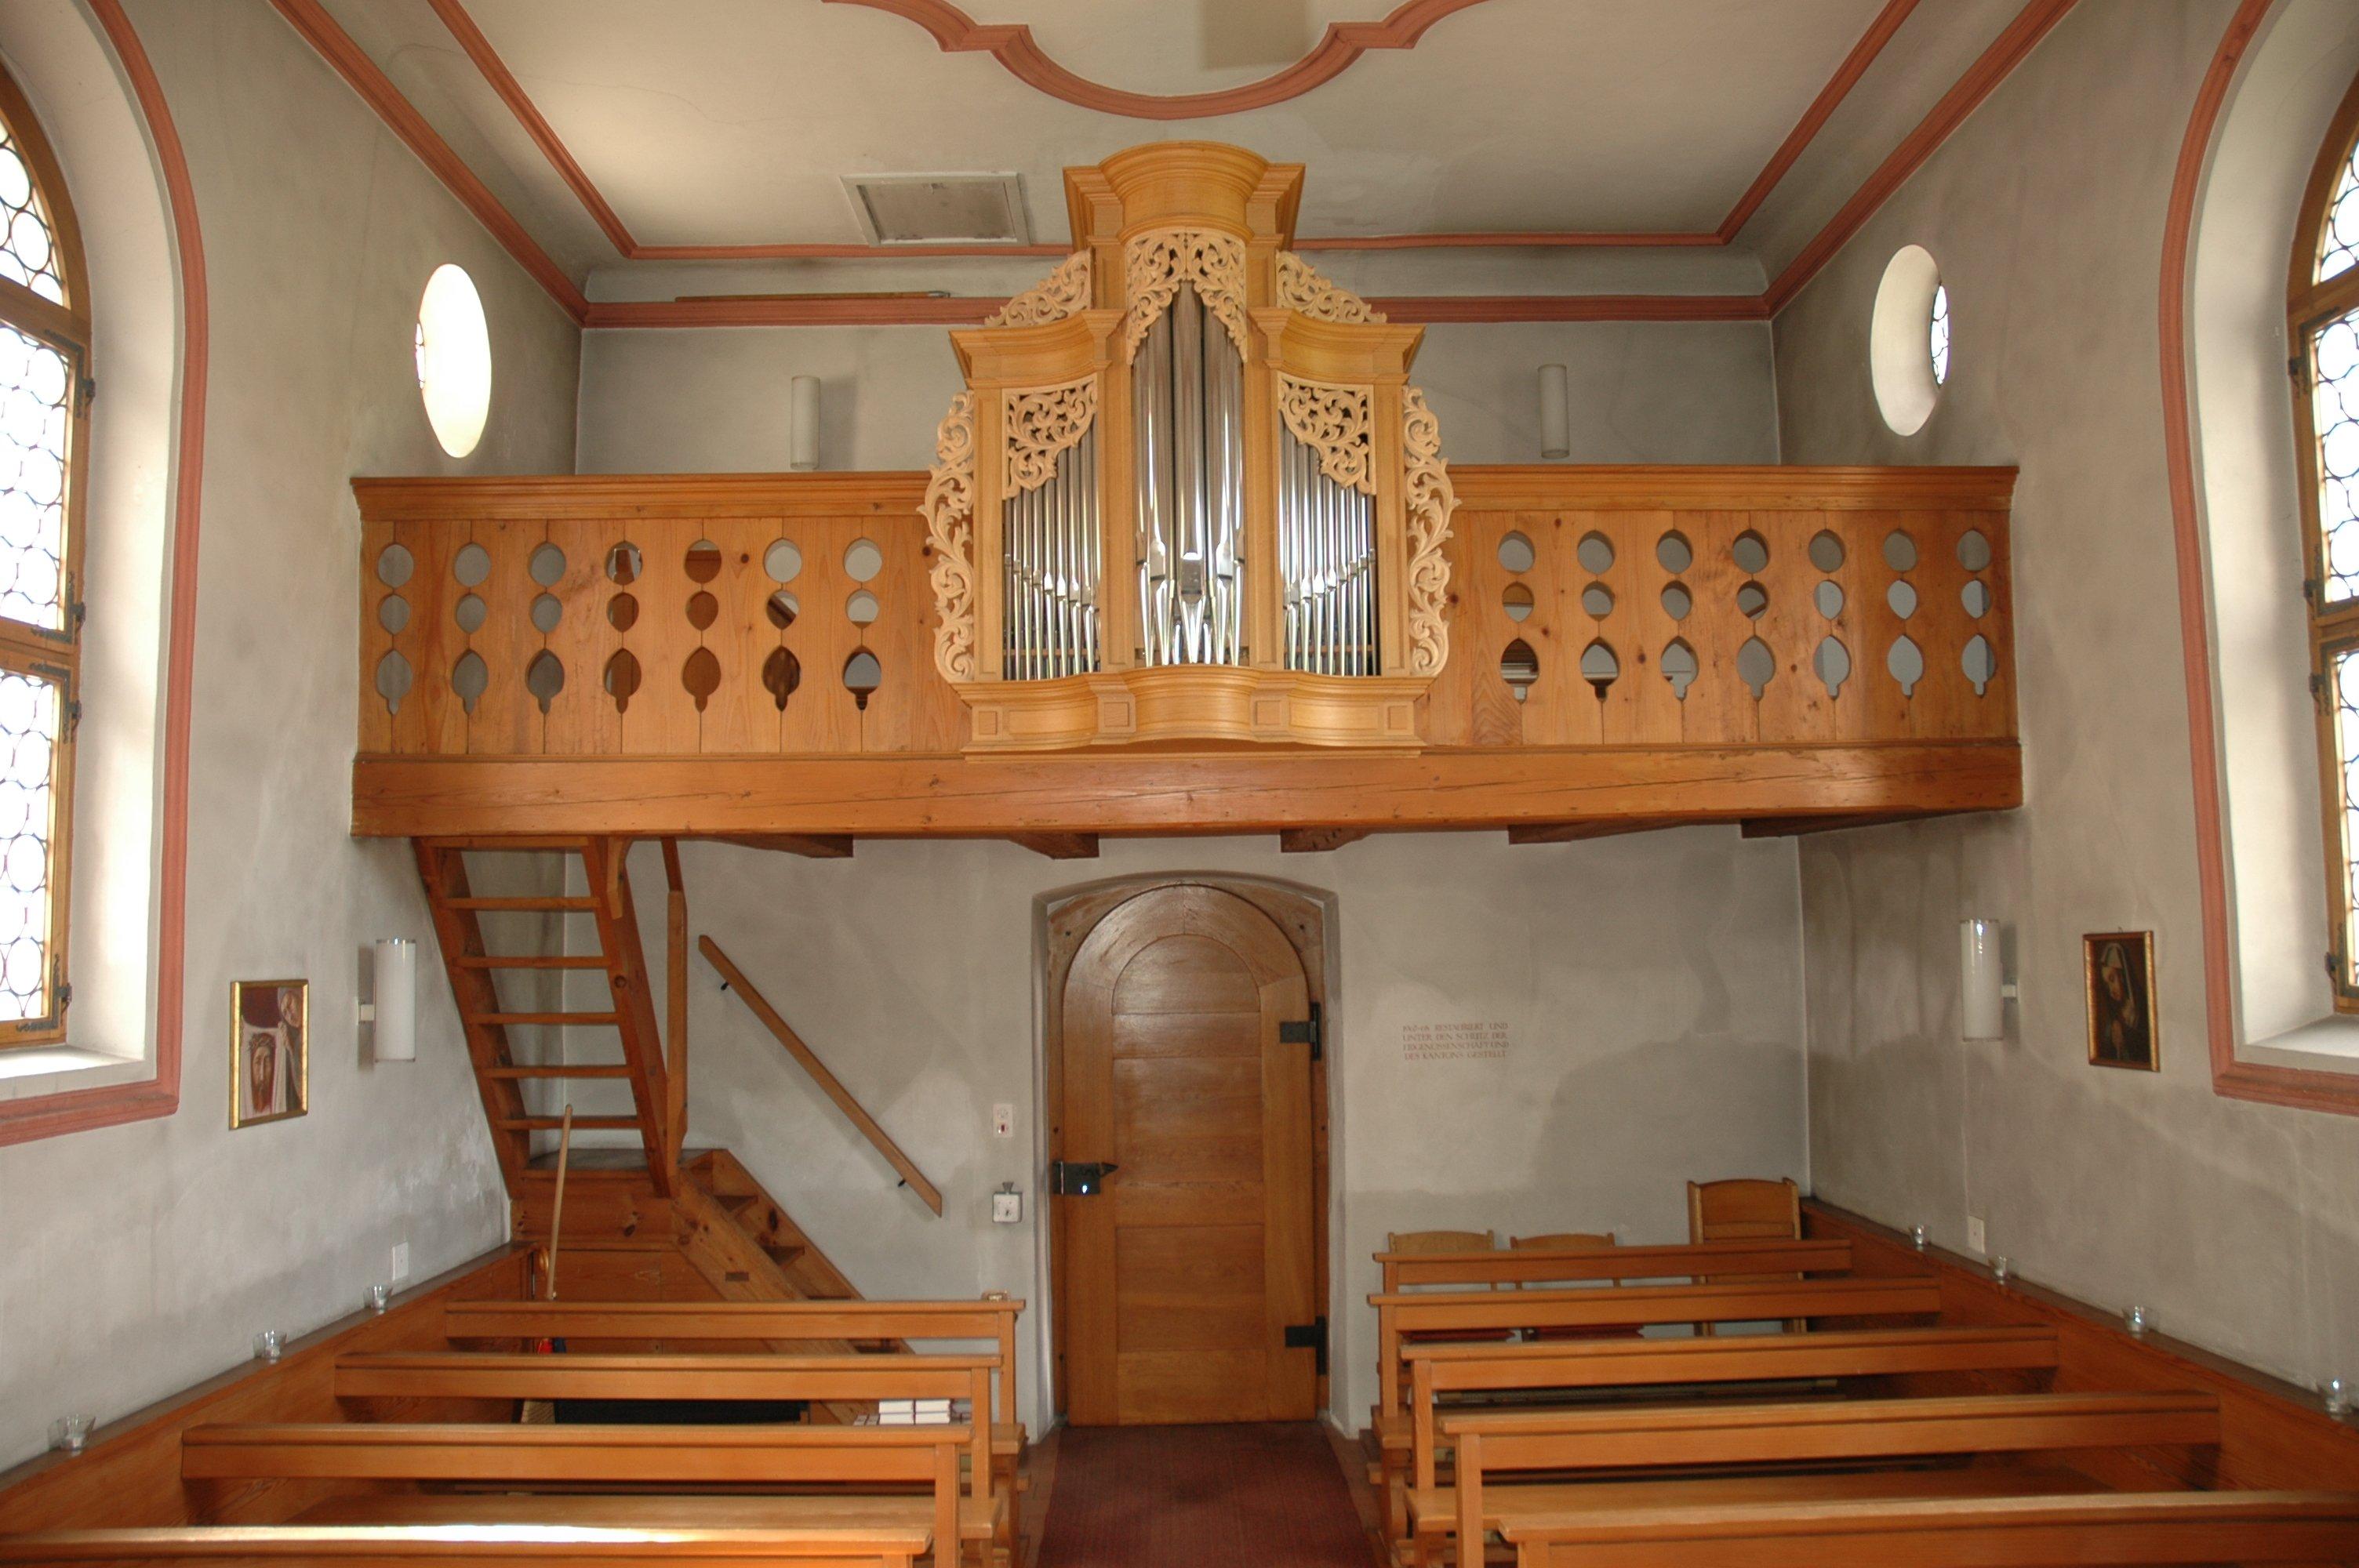 Chäppeli Blick auf Orgel